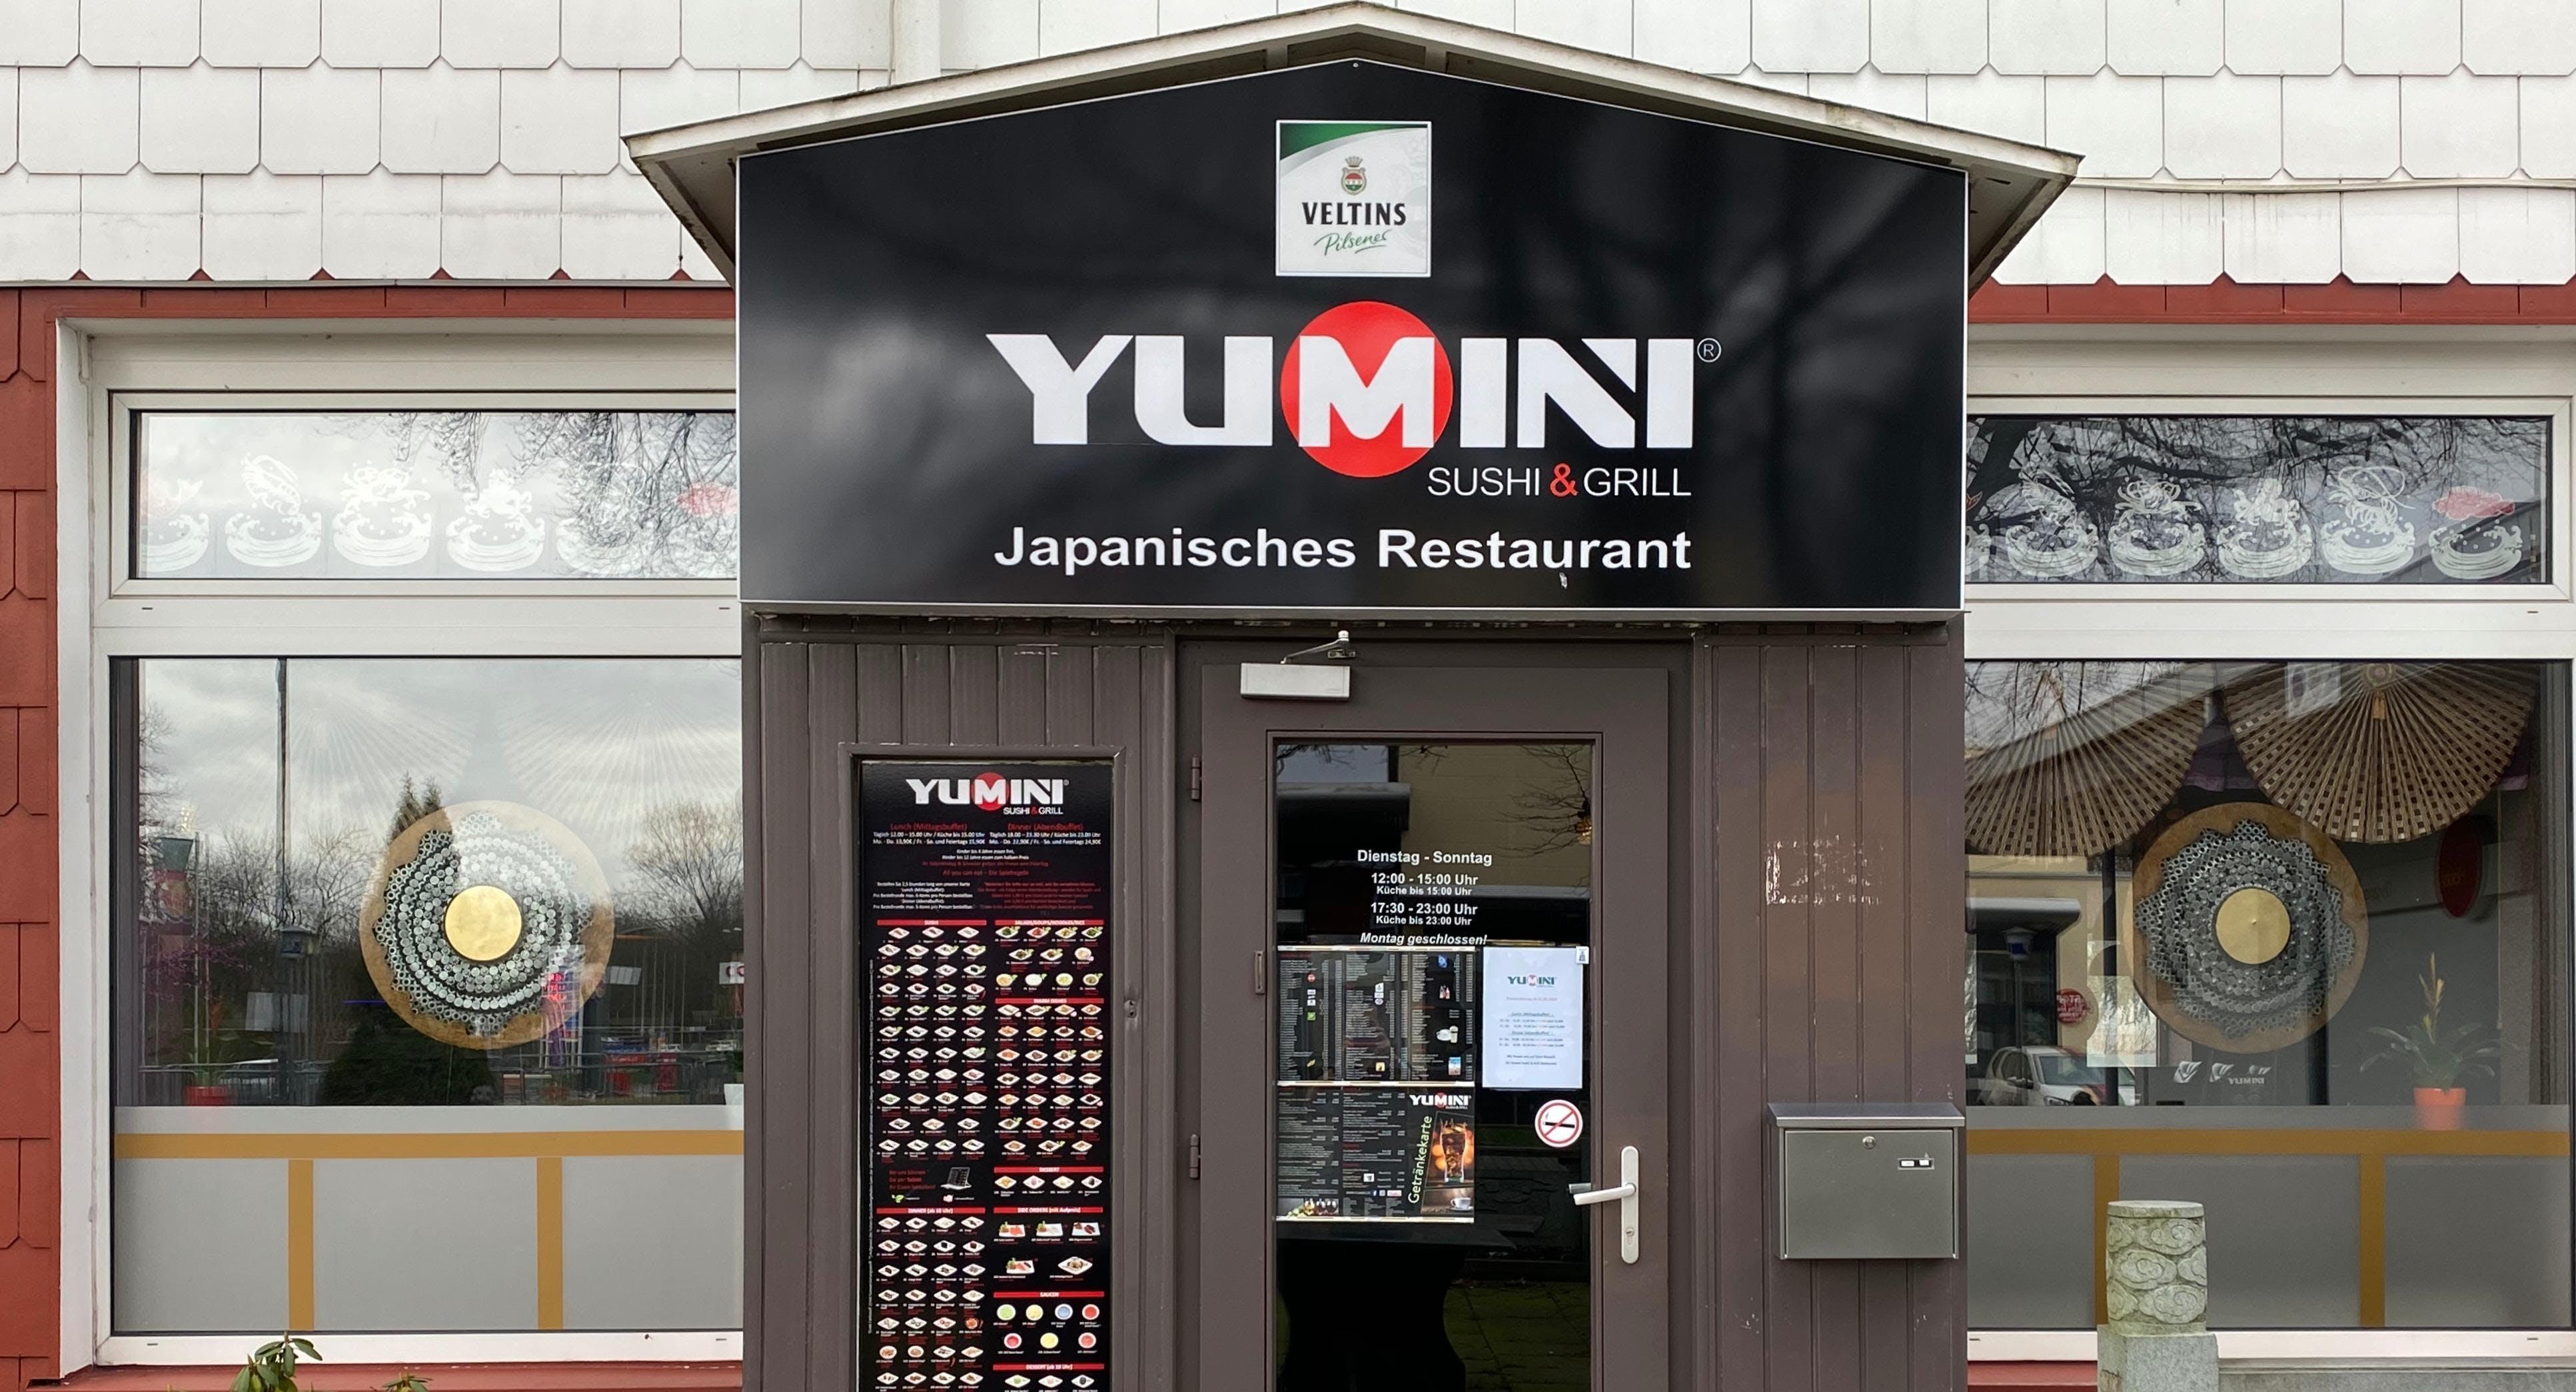 Yumini Gelsenkirchen